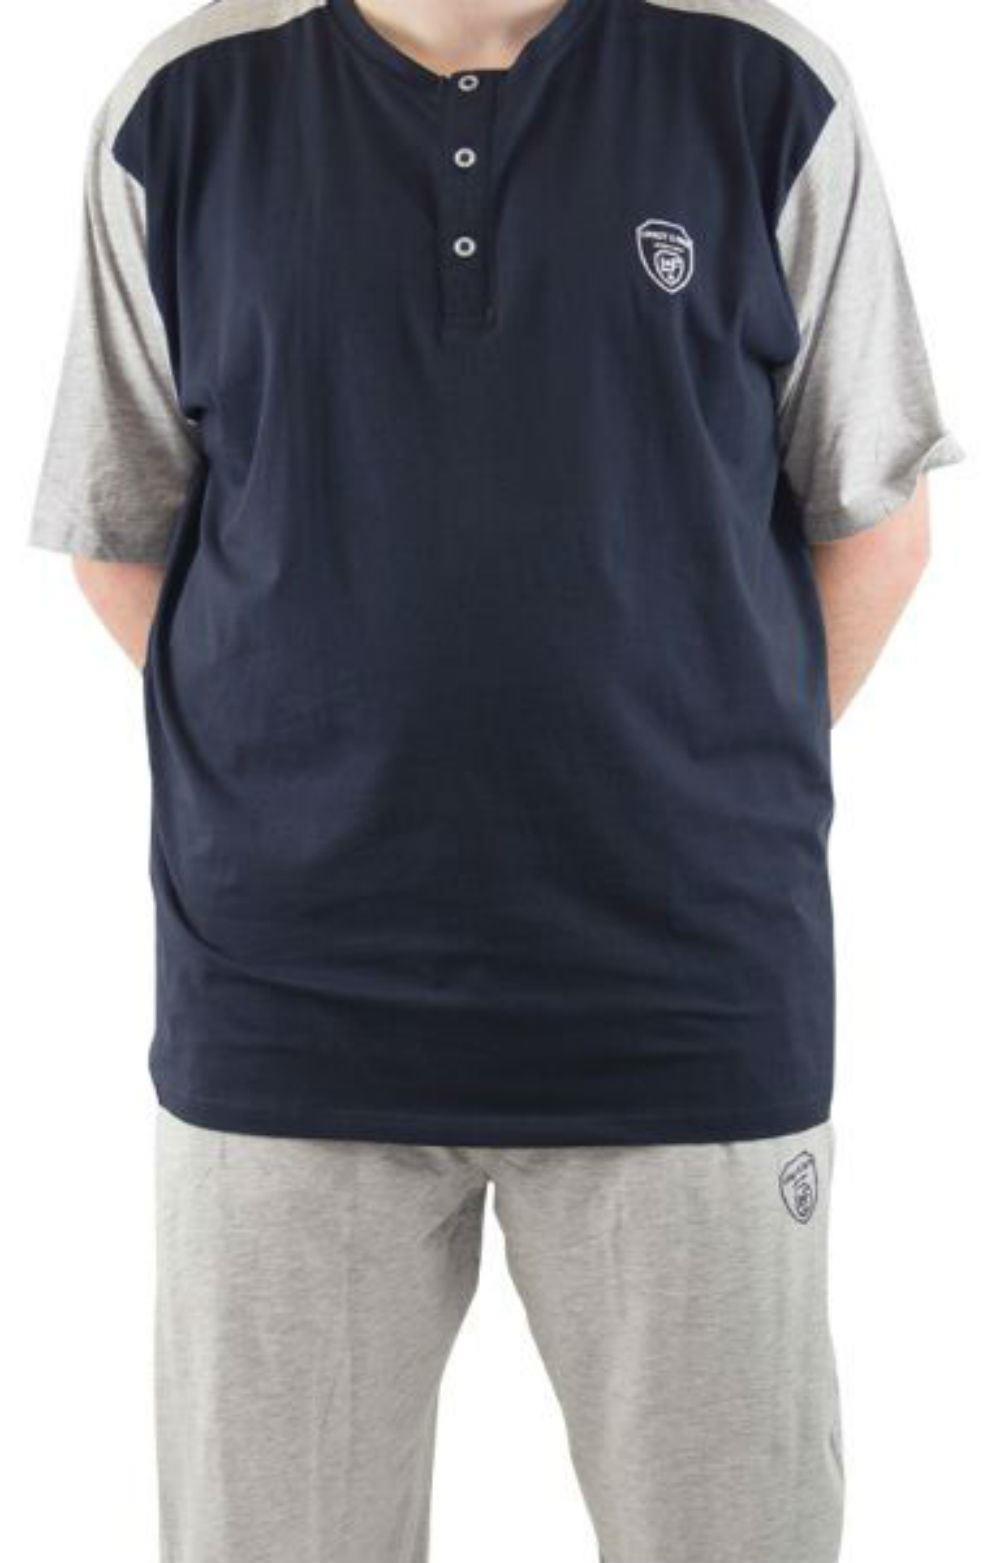 Loyalty and Faith Seattle Top & Bottom Loungewear Set Navy & Grey